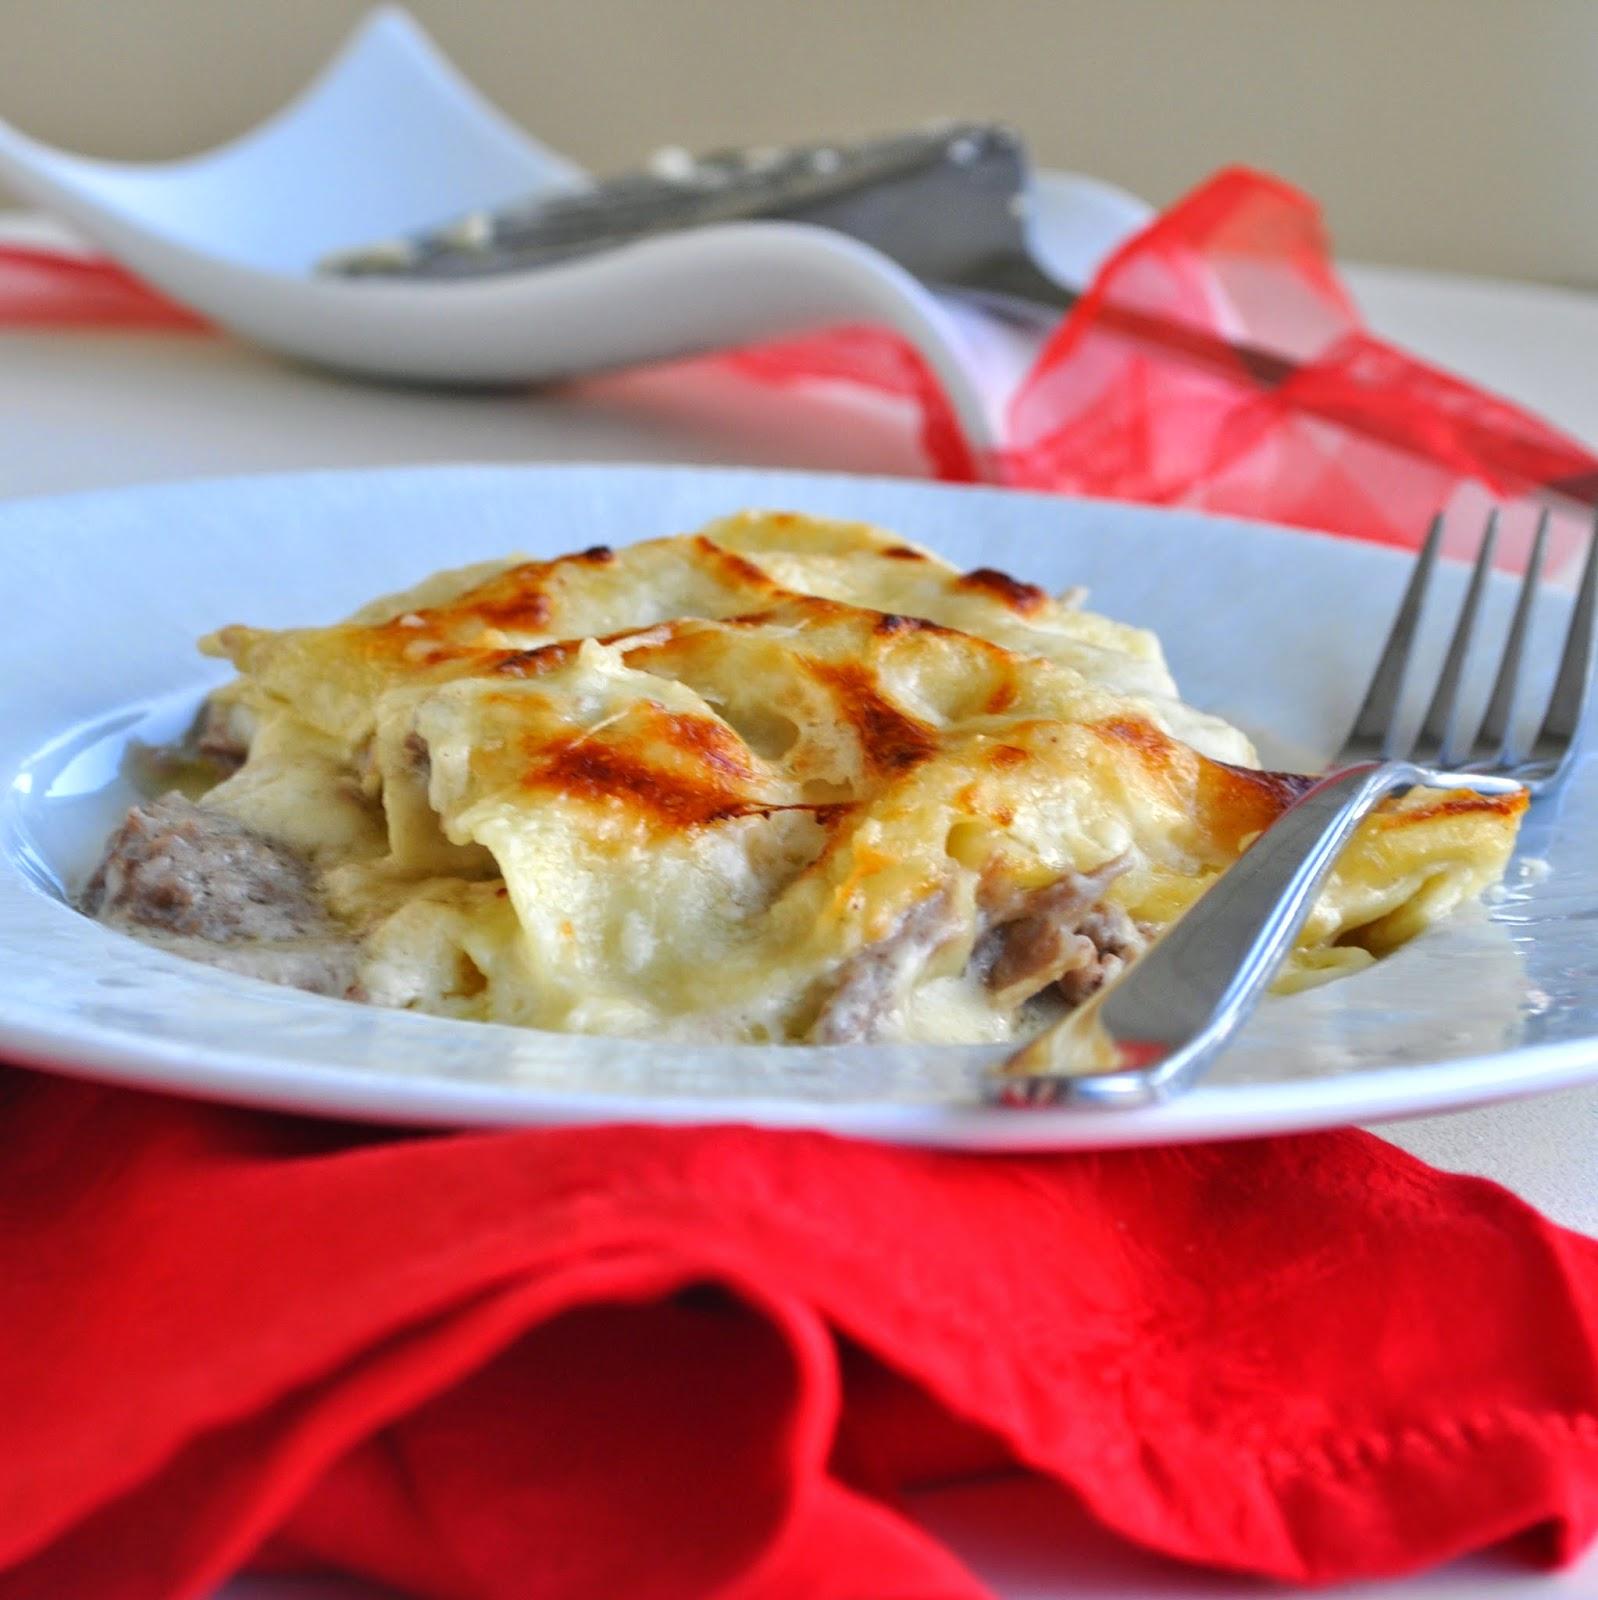 ... , braised duck ragu', and delicate and rich besciamella sauce